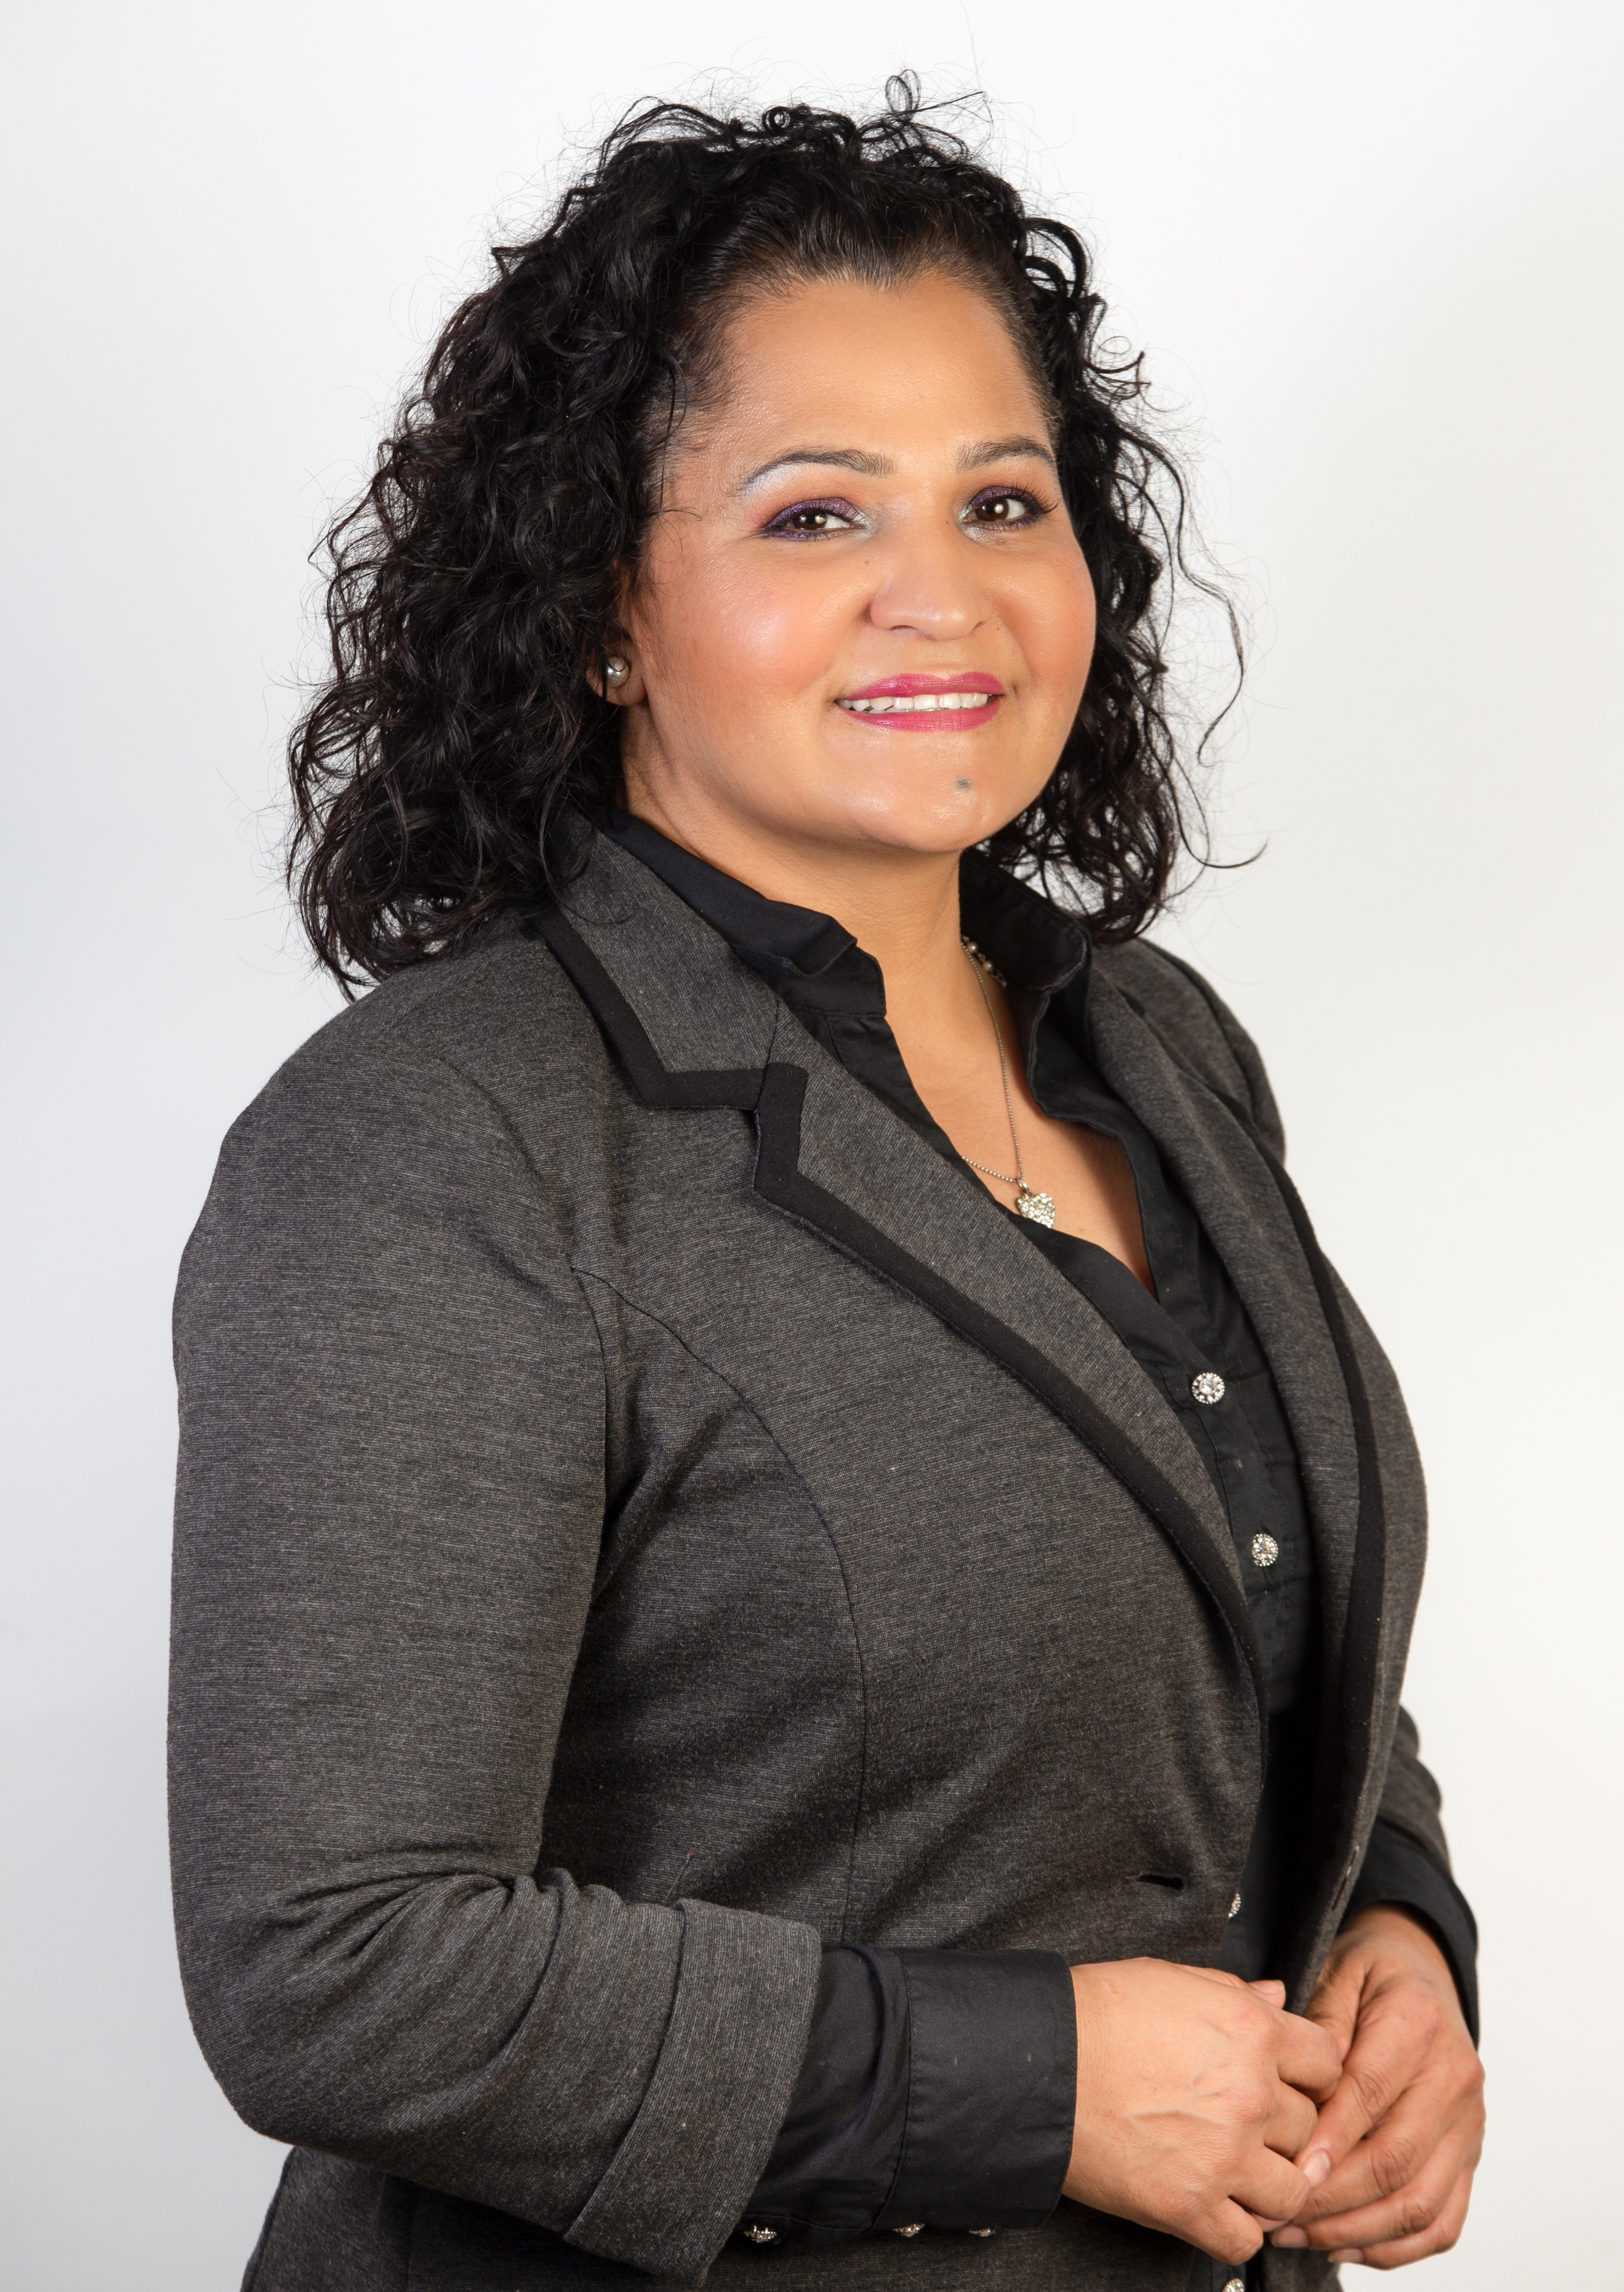 Yesenia Vasquez